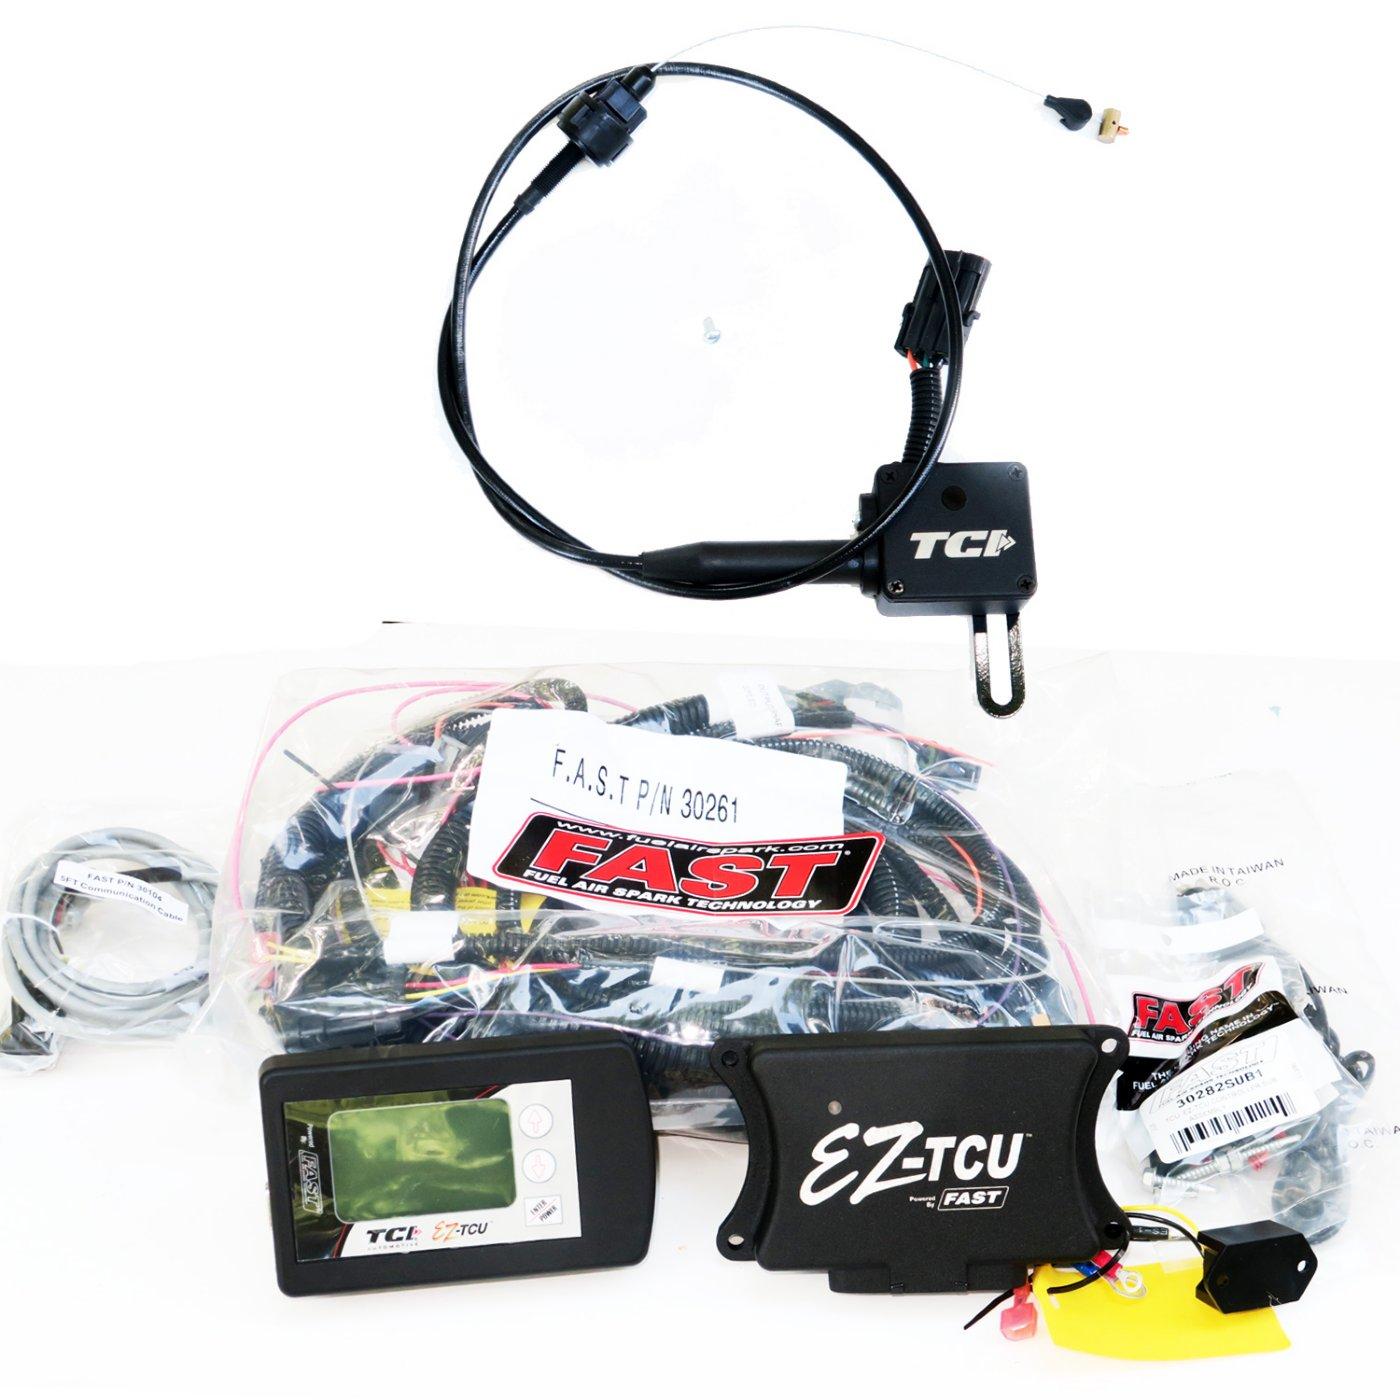 Tci 700r4 2004r Universal Transmission Lock Up Kit Autos